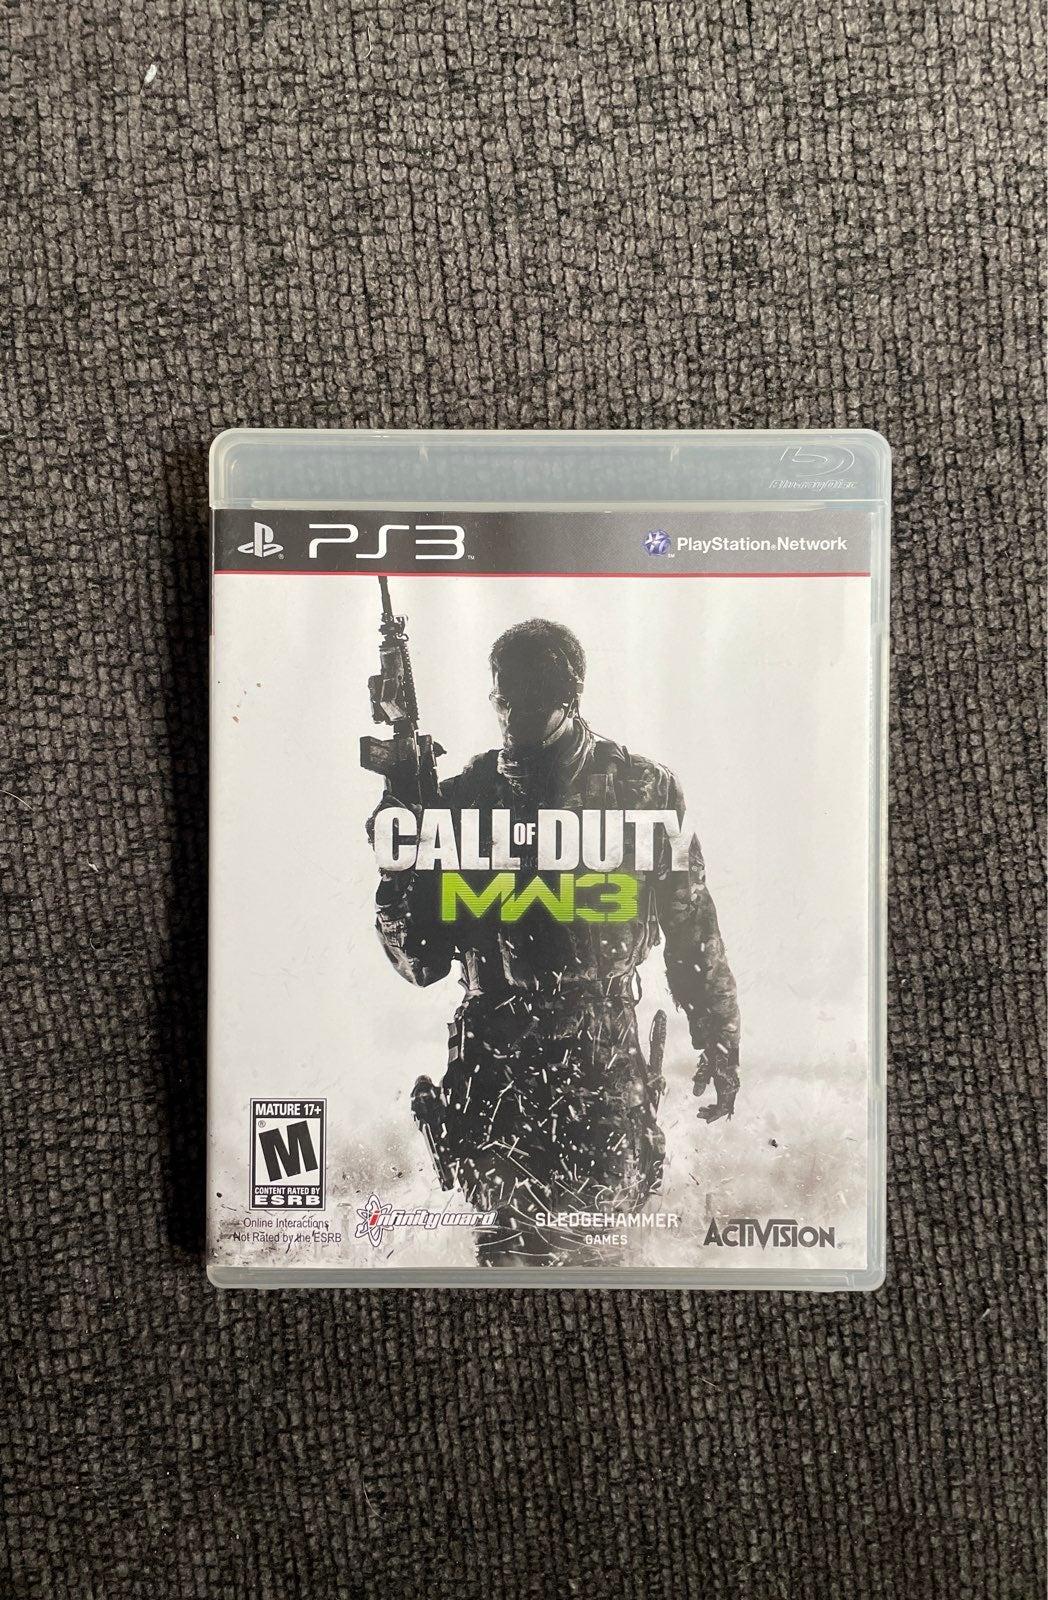 Call of Duty: Modern Warfare 3 on PS3